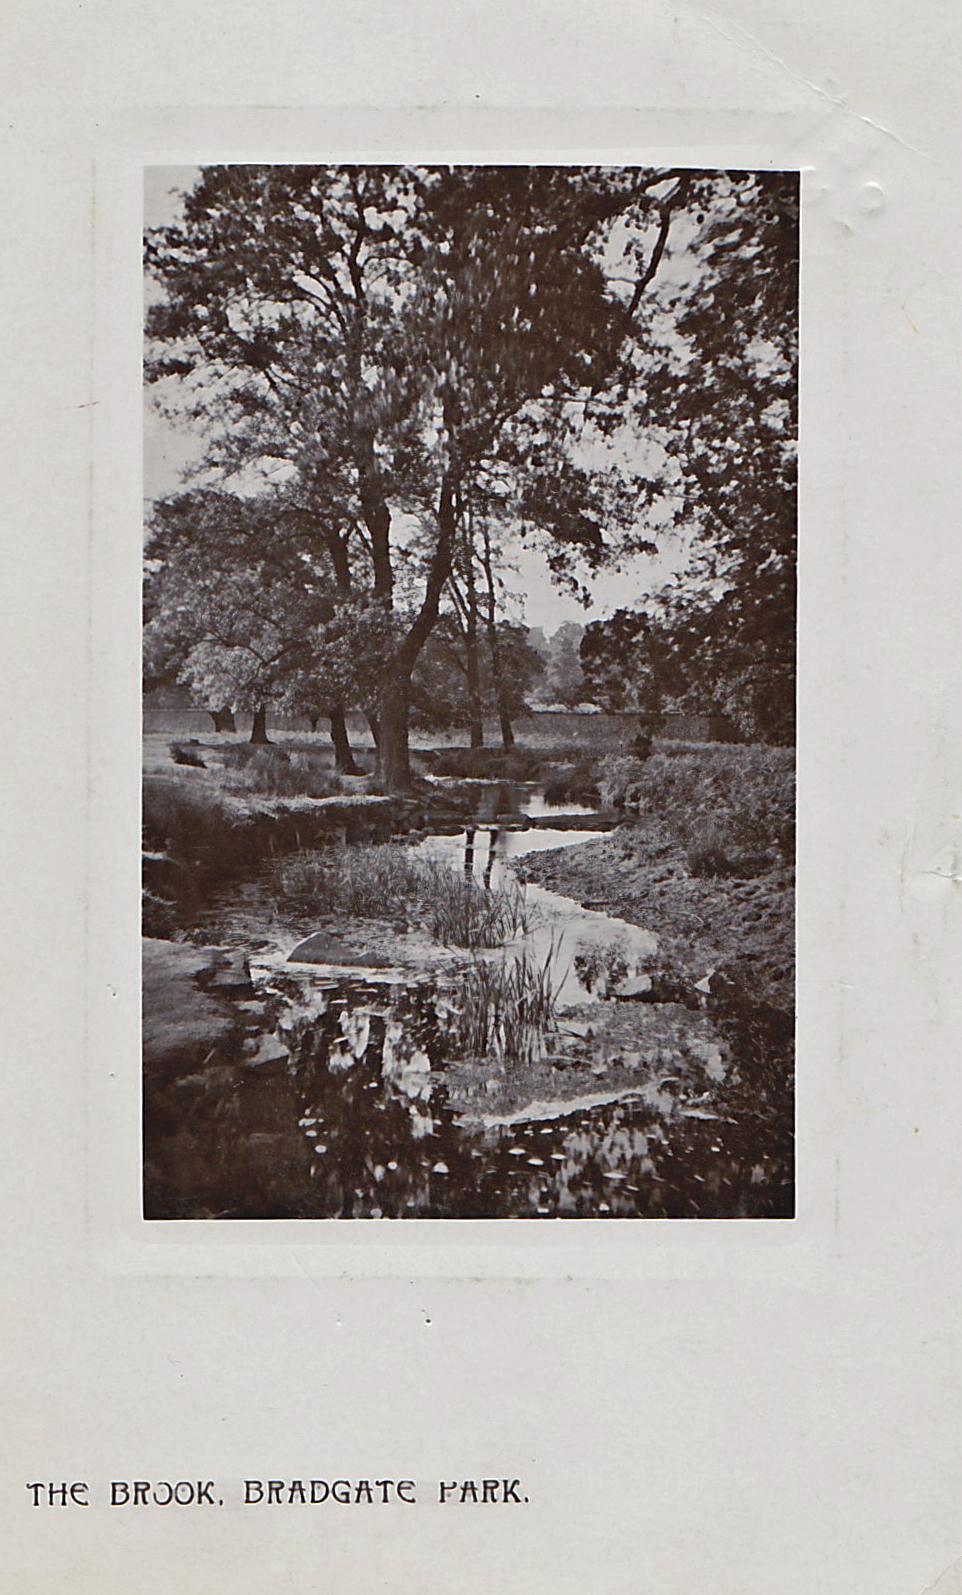 Bradgate Park, Leicester. 1901-1920: The brook. Franked 1907 (File:1502)